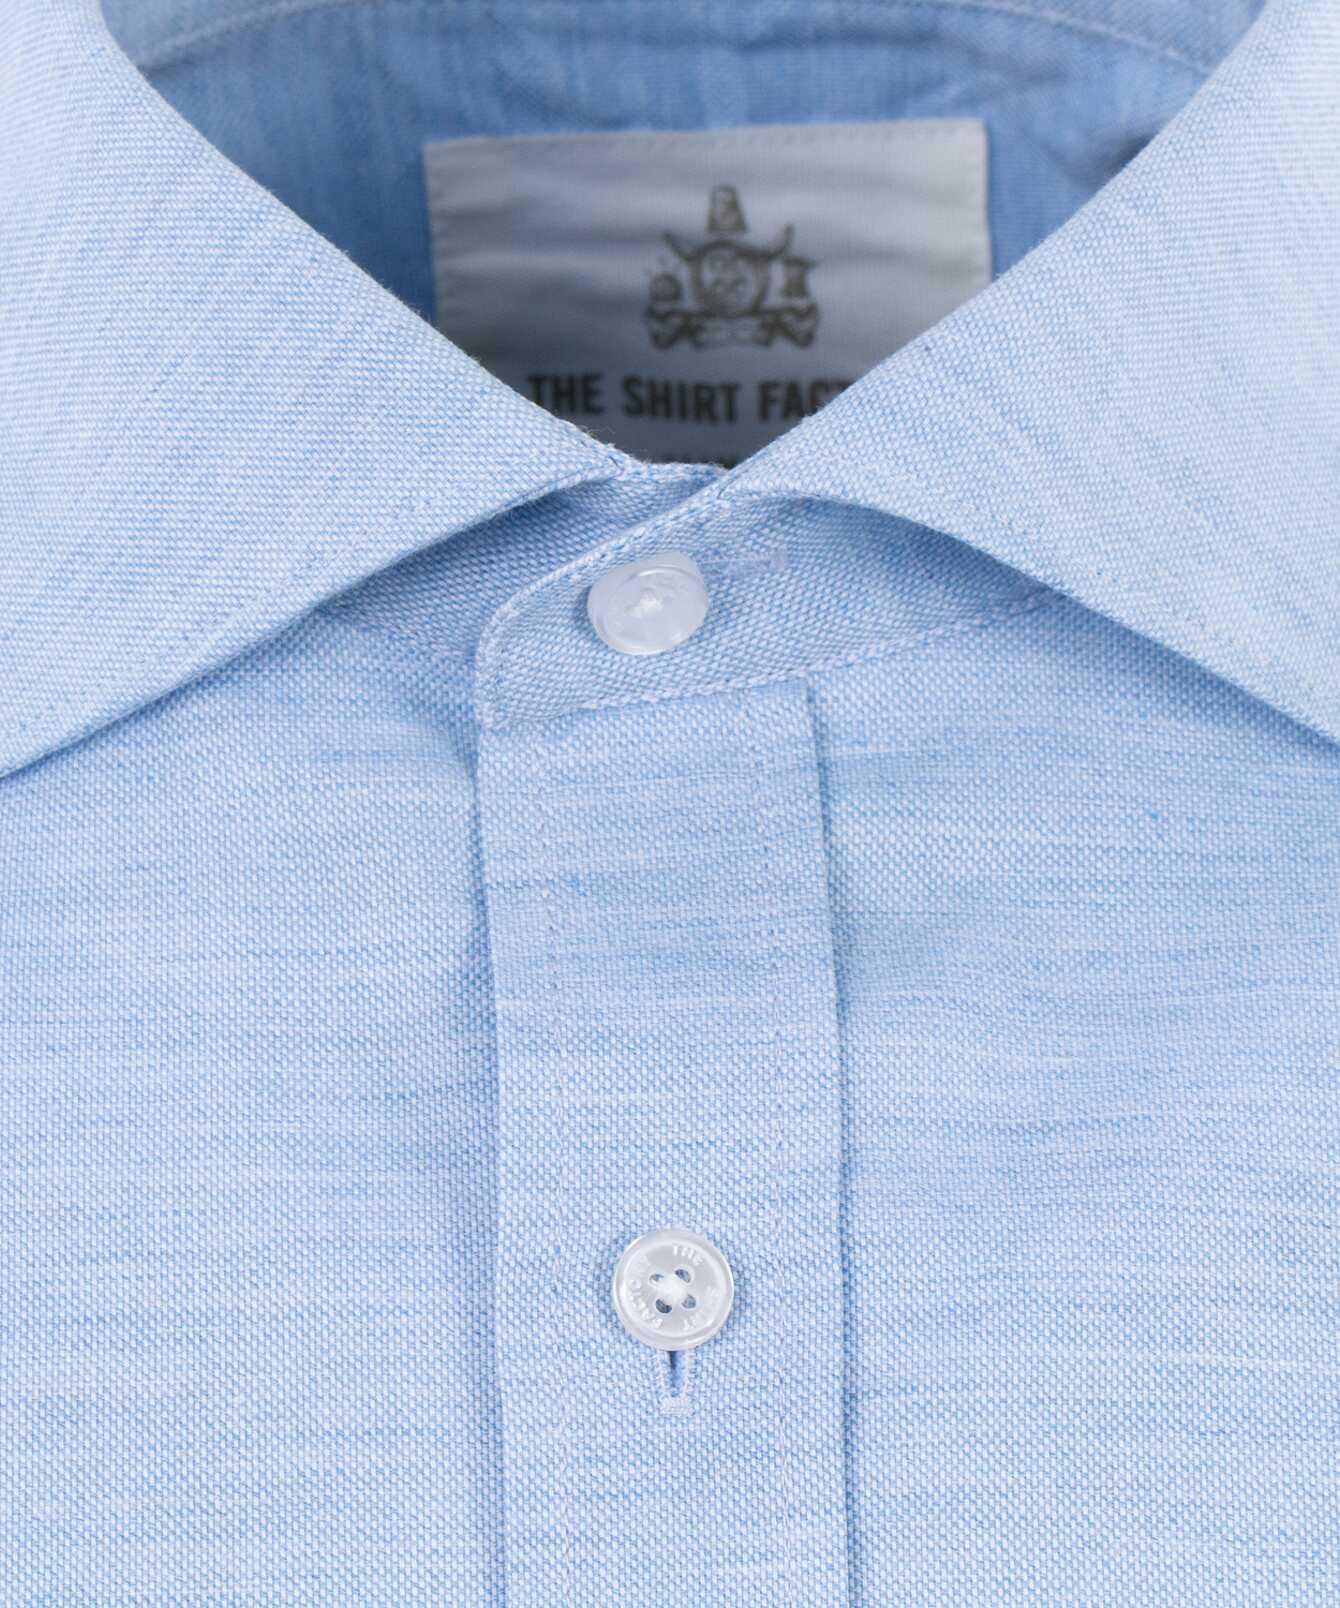 Skjorta Roscoe The Shirt Factory